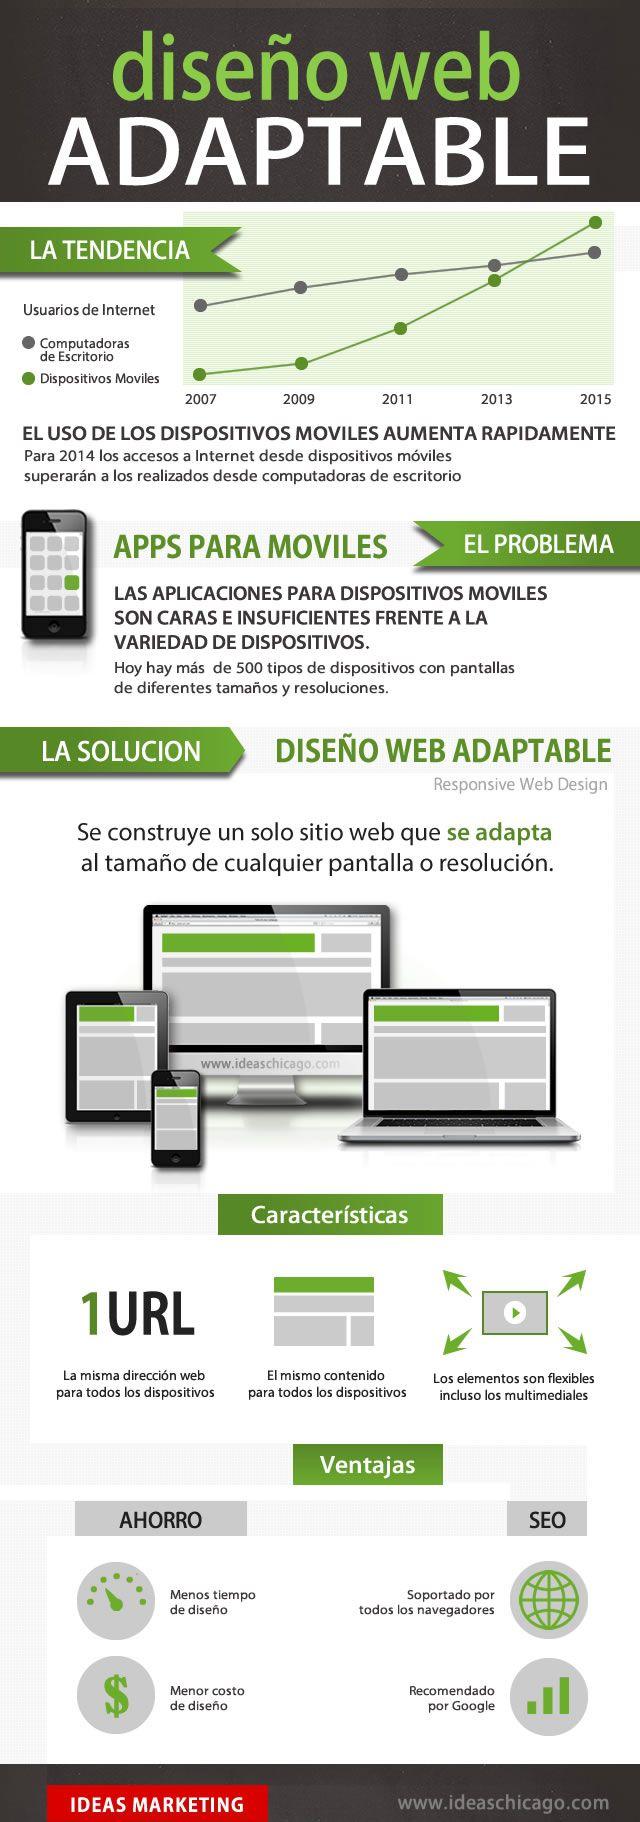 Diseño web adaptable [infografia]